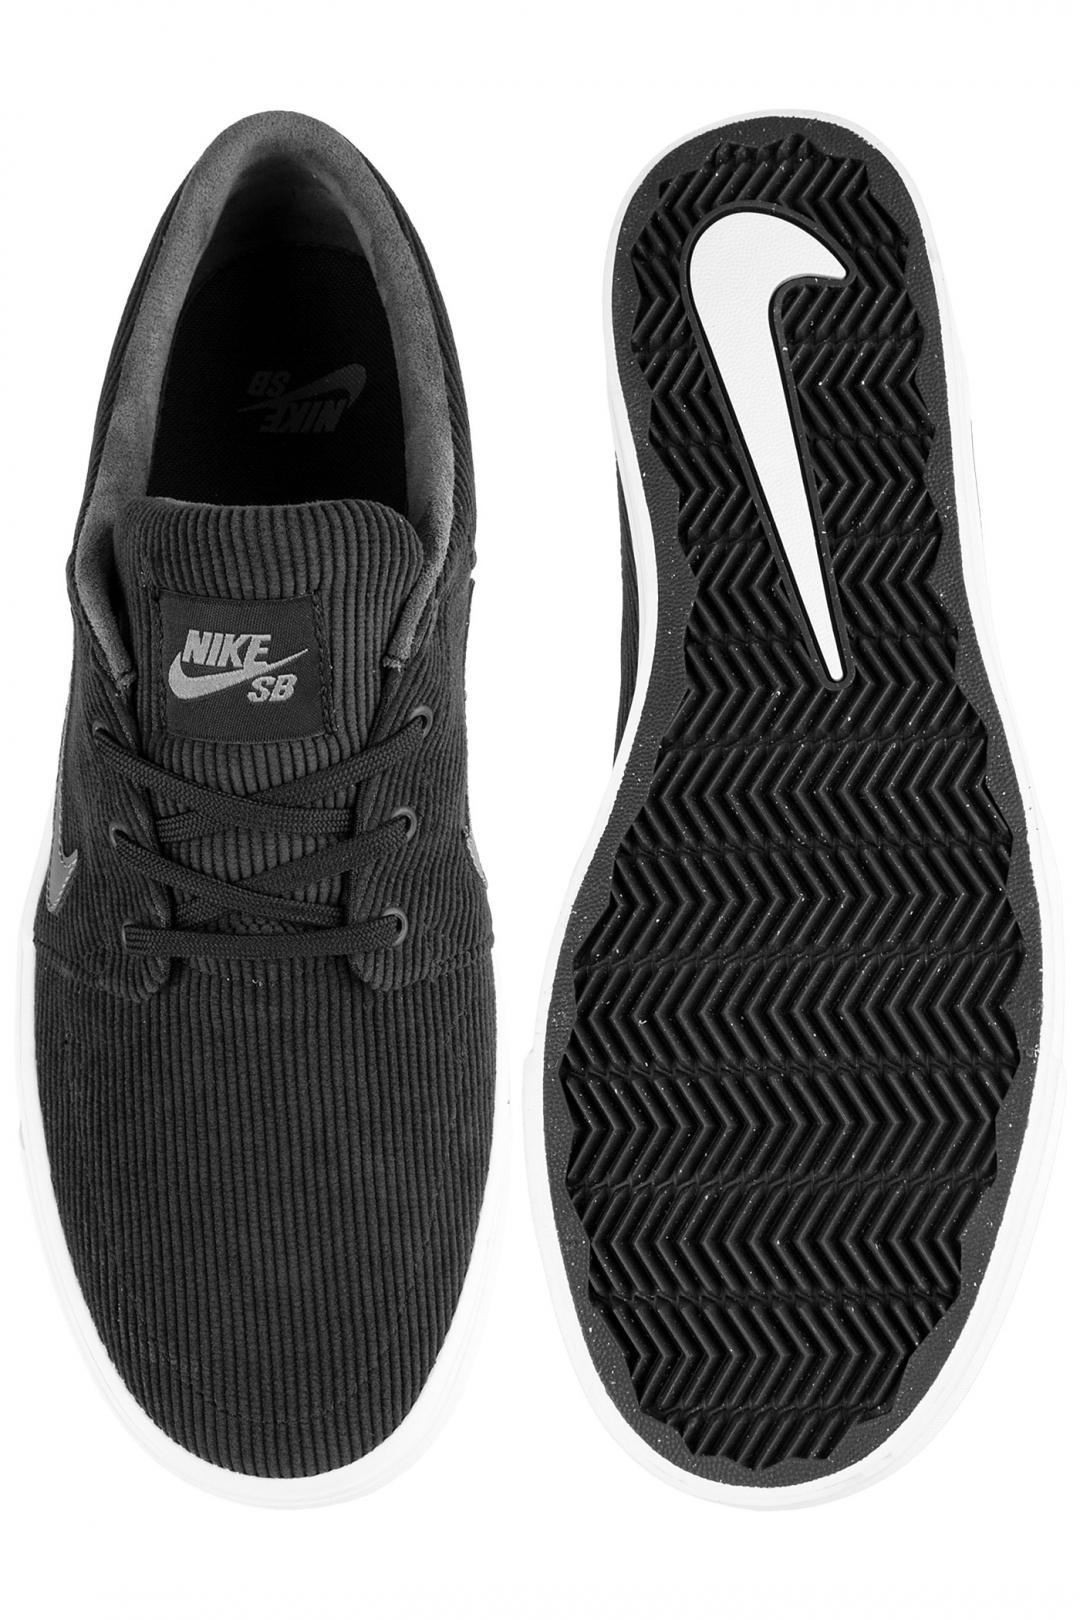 Uomo/Donna Nike SB Portmore Canvas black dark grey | Sneaker